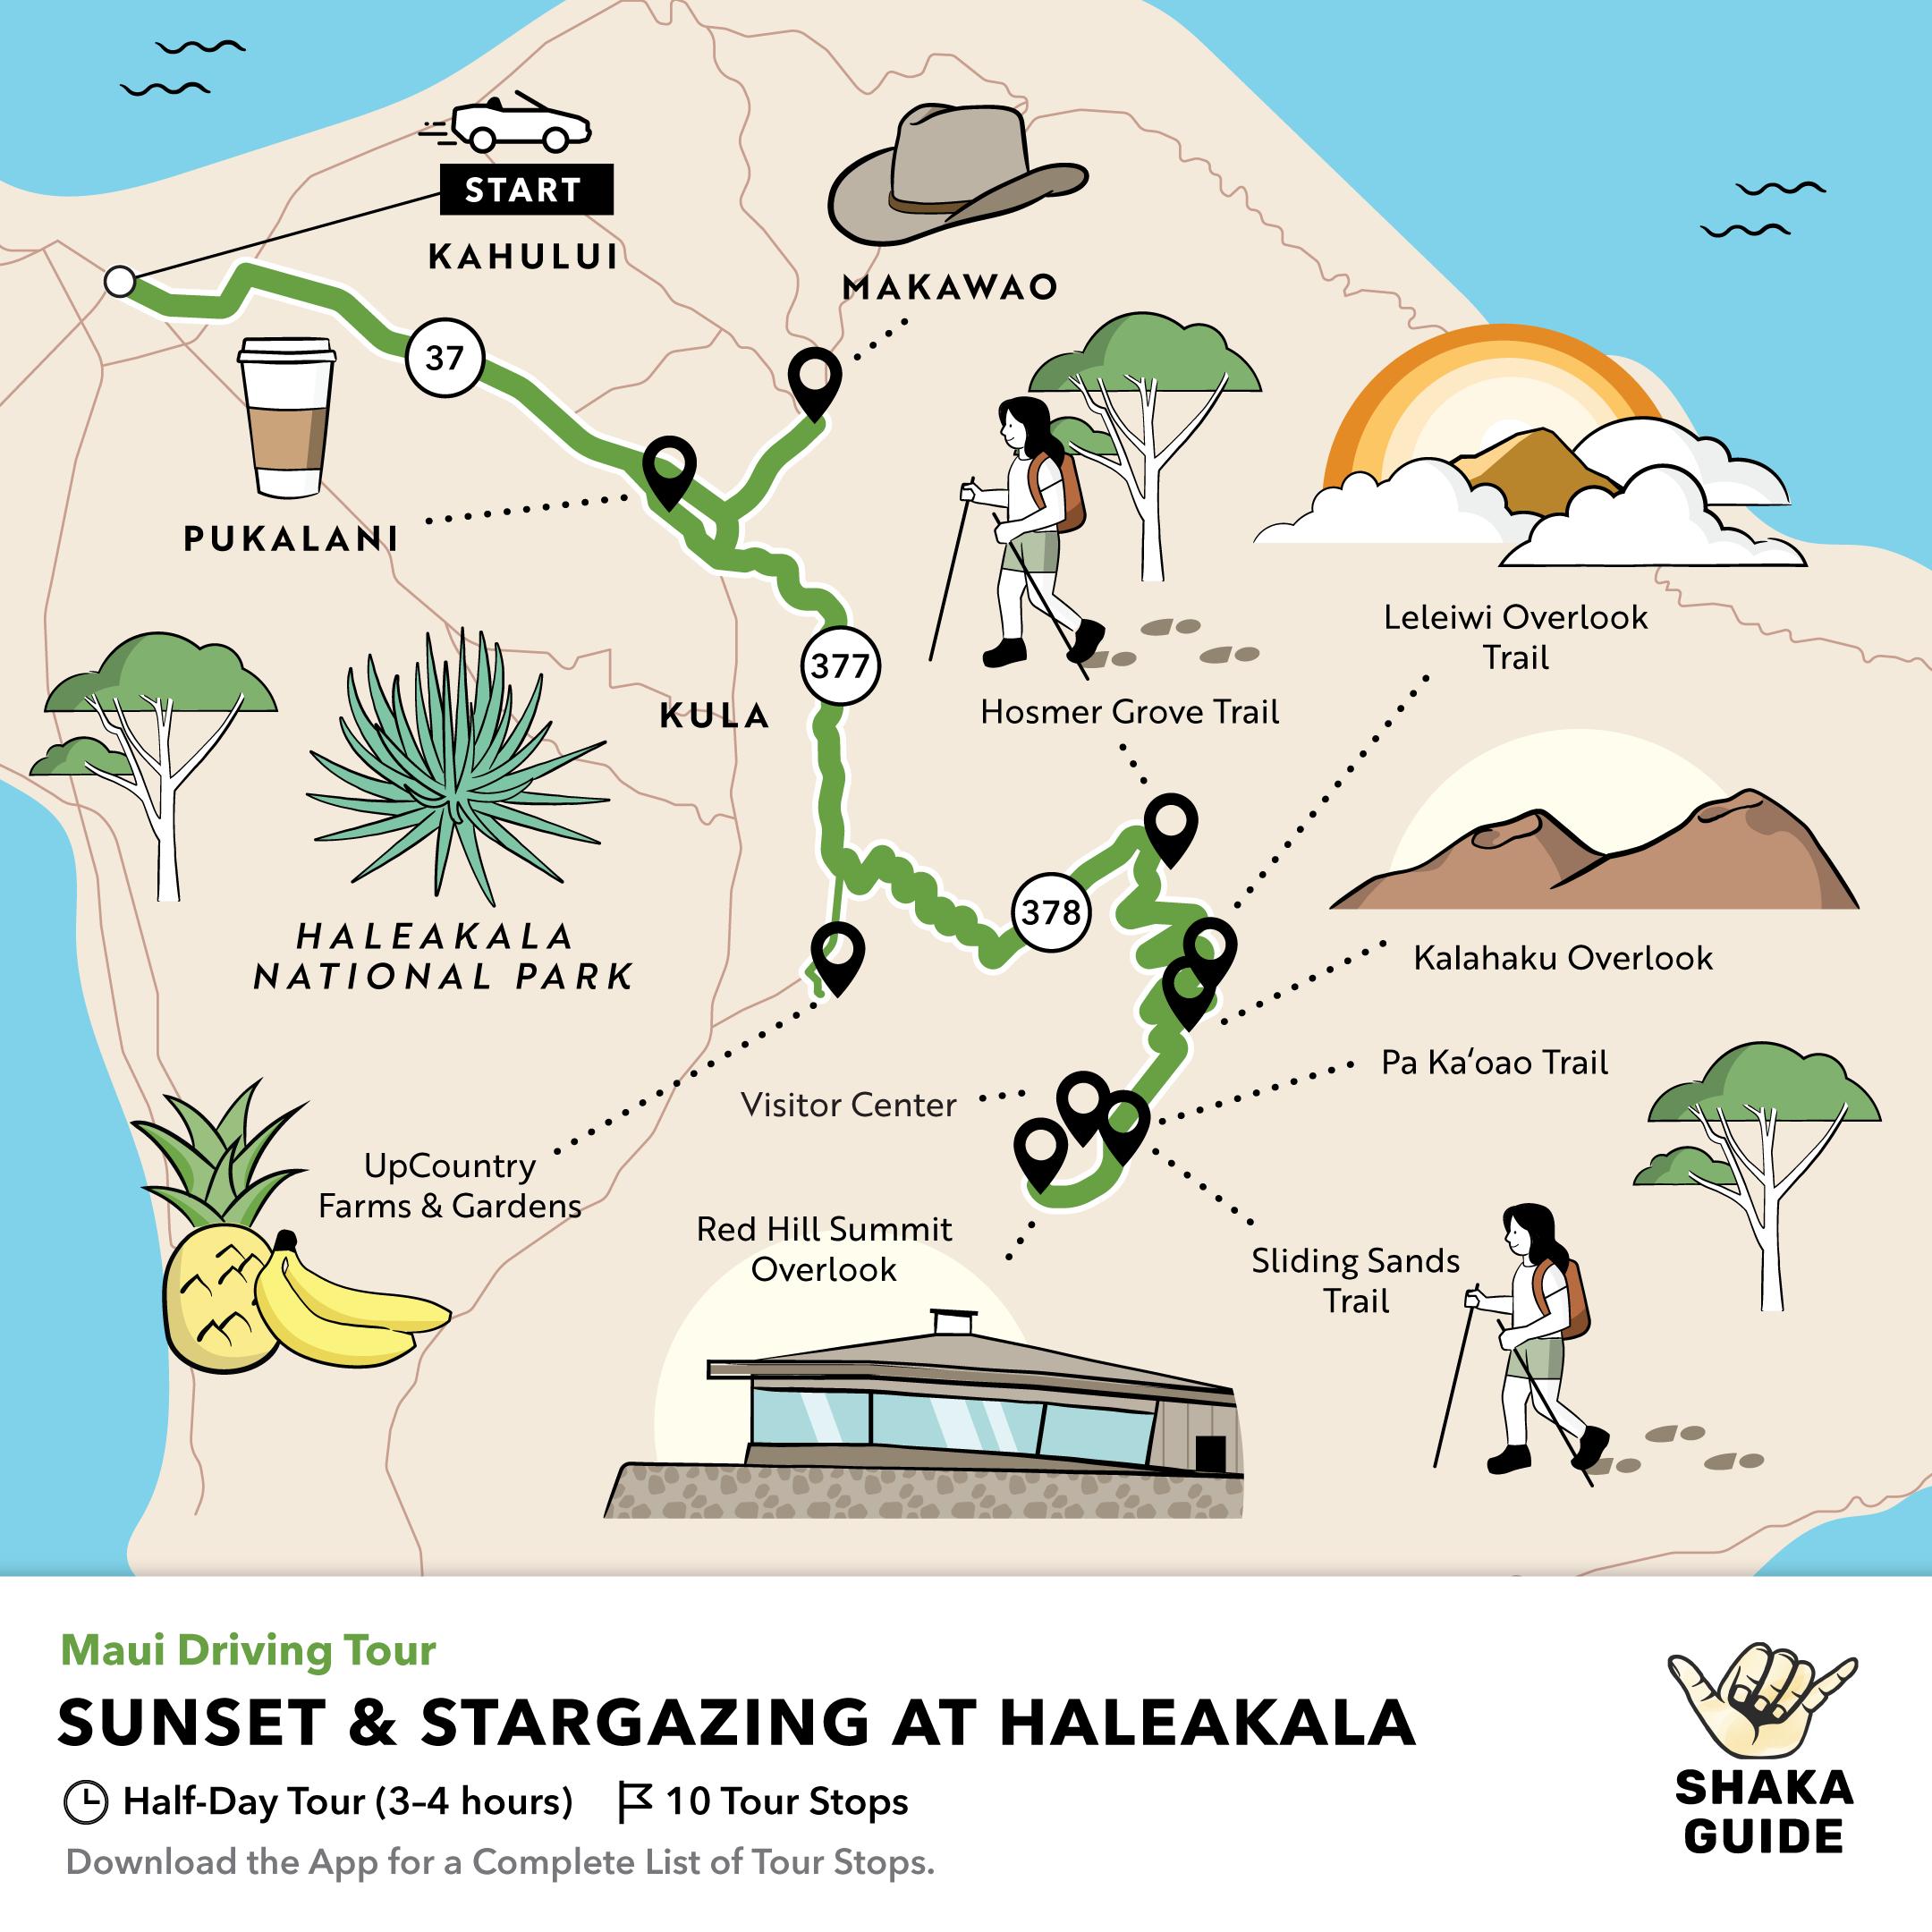 Shaka Guide's Sunset and Stargazing Haleakala Tour